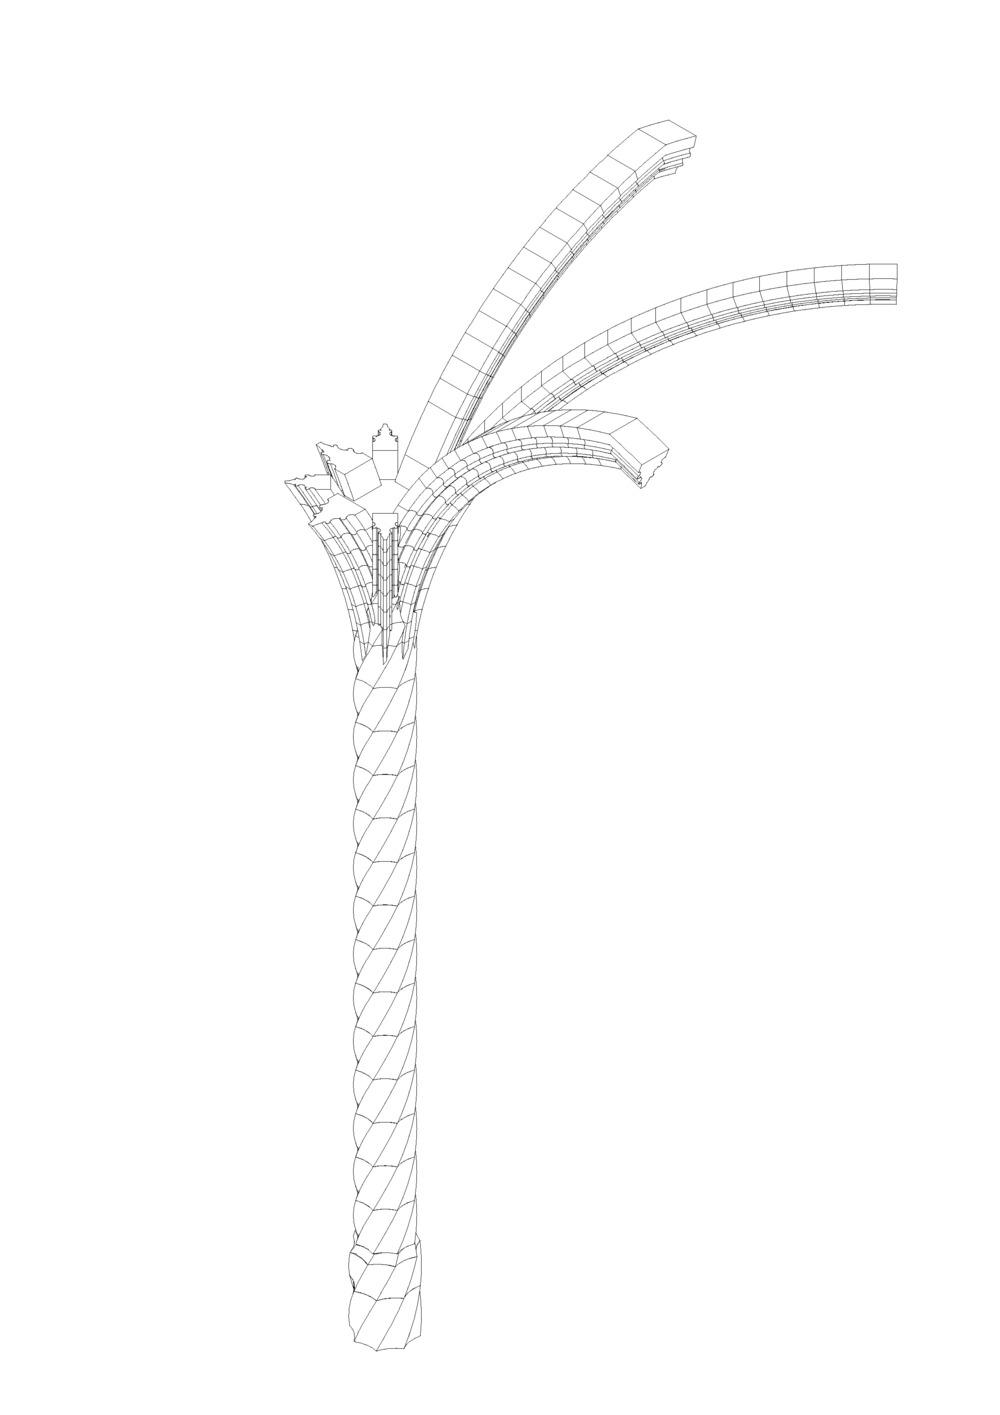 Fig_18_DetallePilar_F.Cifuentes.jpg